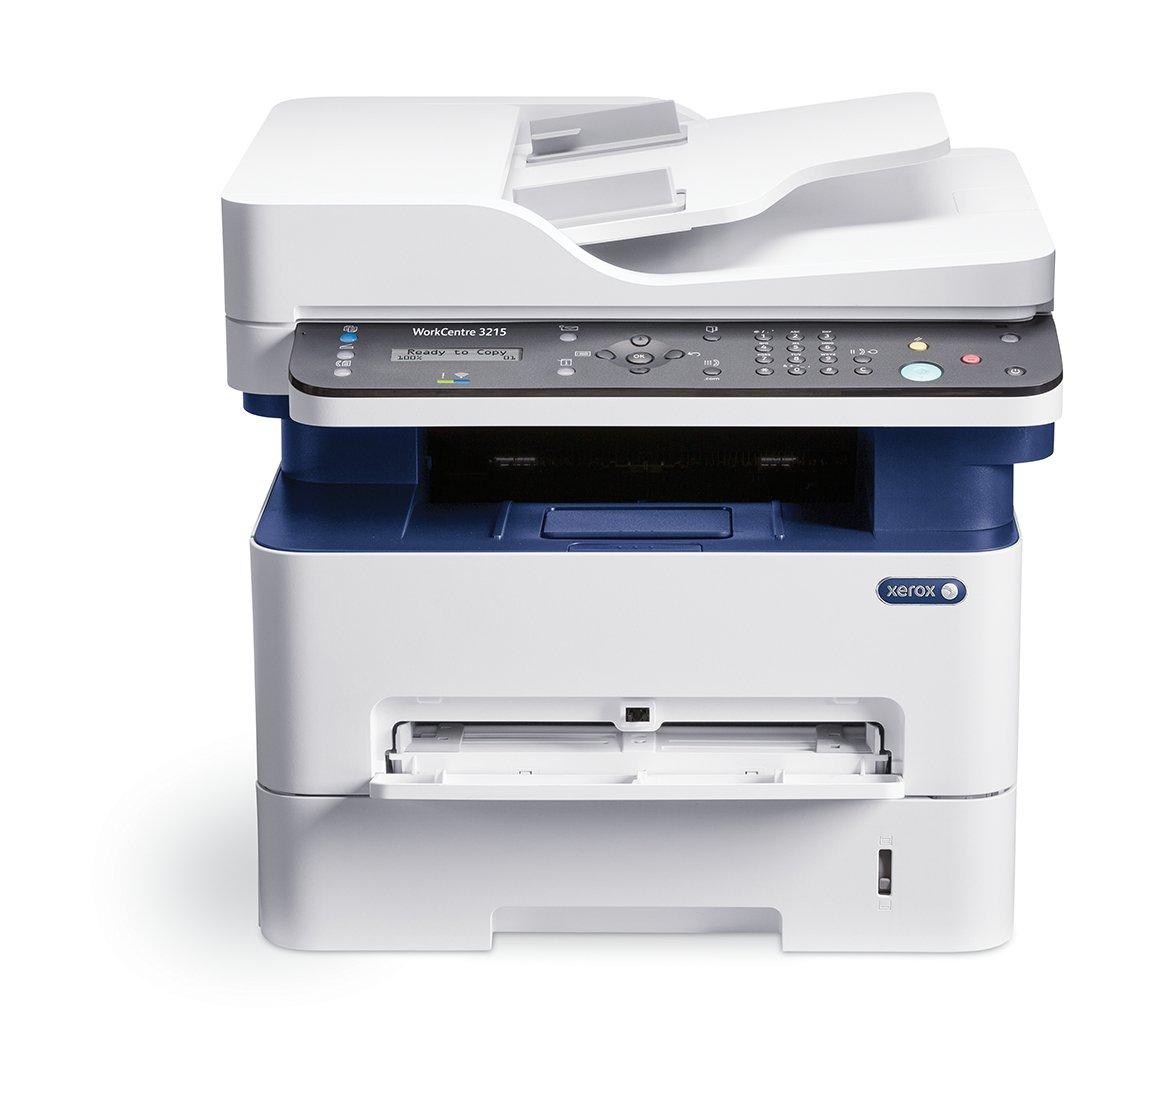 Amazon.com: Xerox WorkCentre 3215/NI Monochrome Multifunction ...